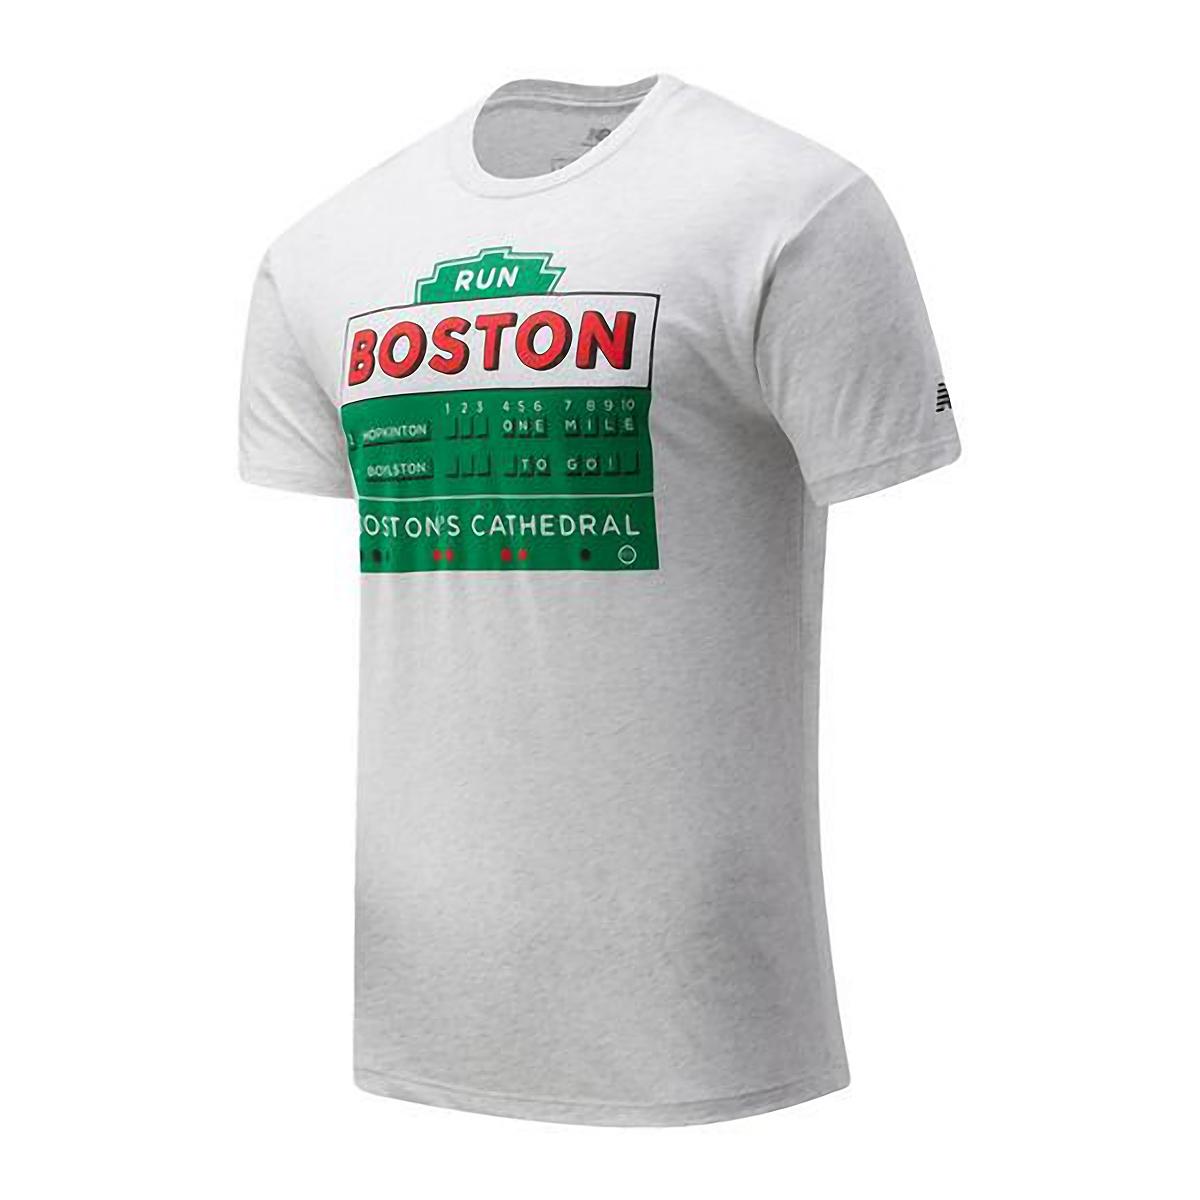 Men's New Balance Boston Graphic Short Sleeve Shirt - Color: White - Size: S, White, large, image 1